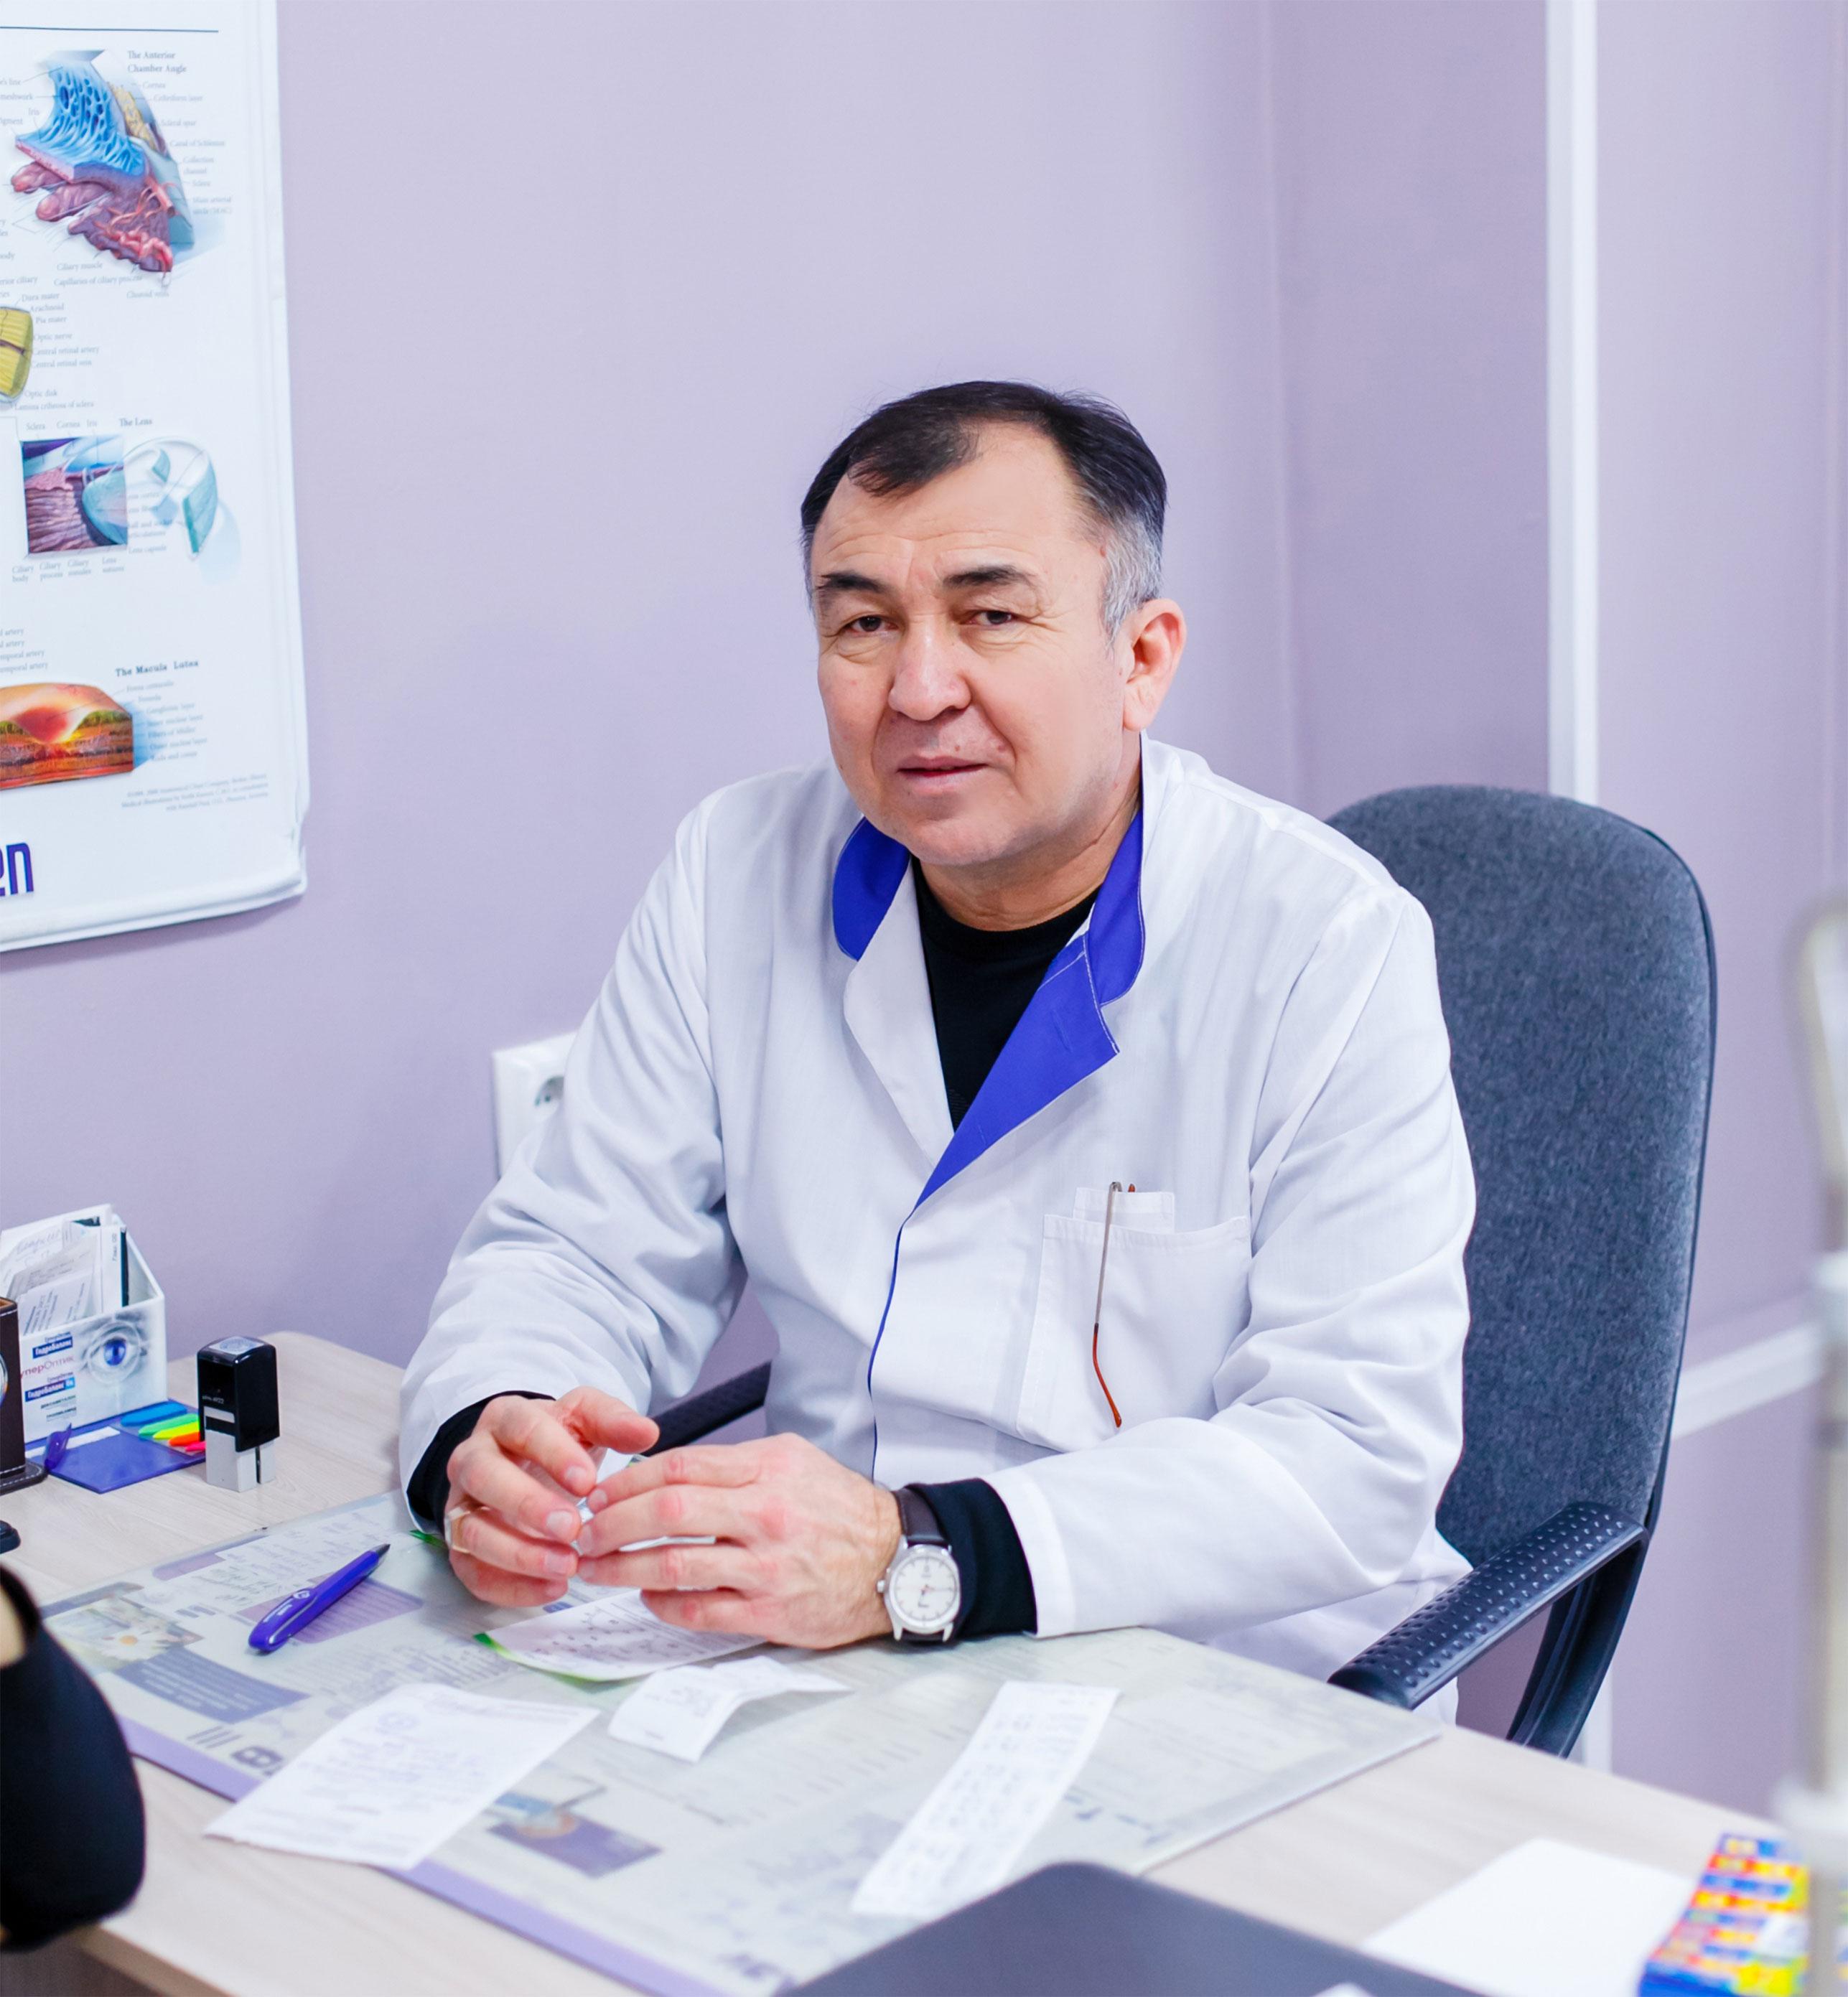 Таджиков-Жангельды-Кулунович---Офтальмолог